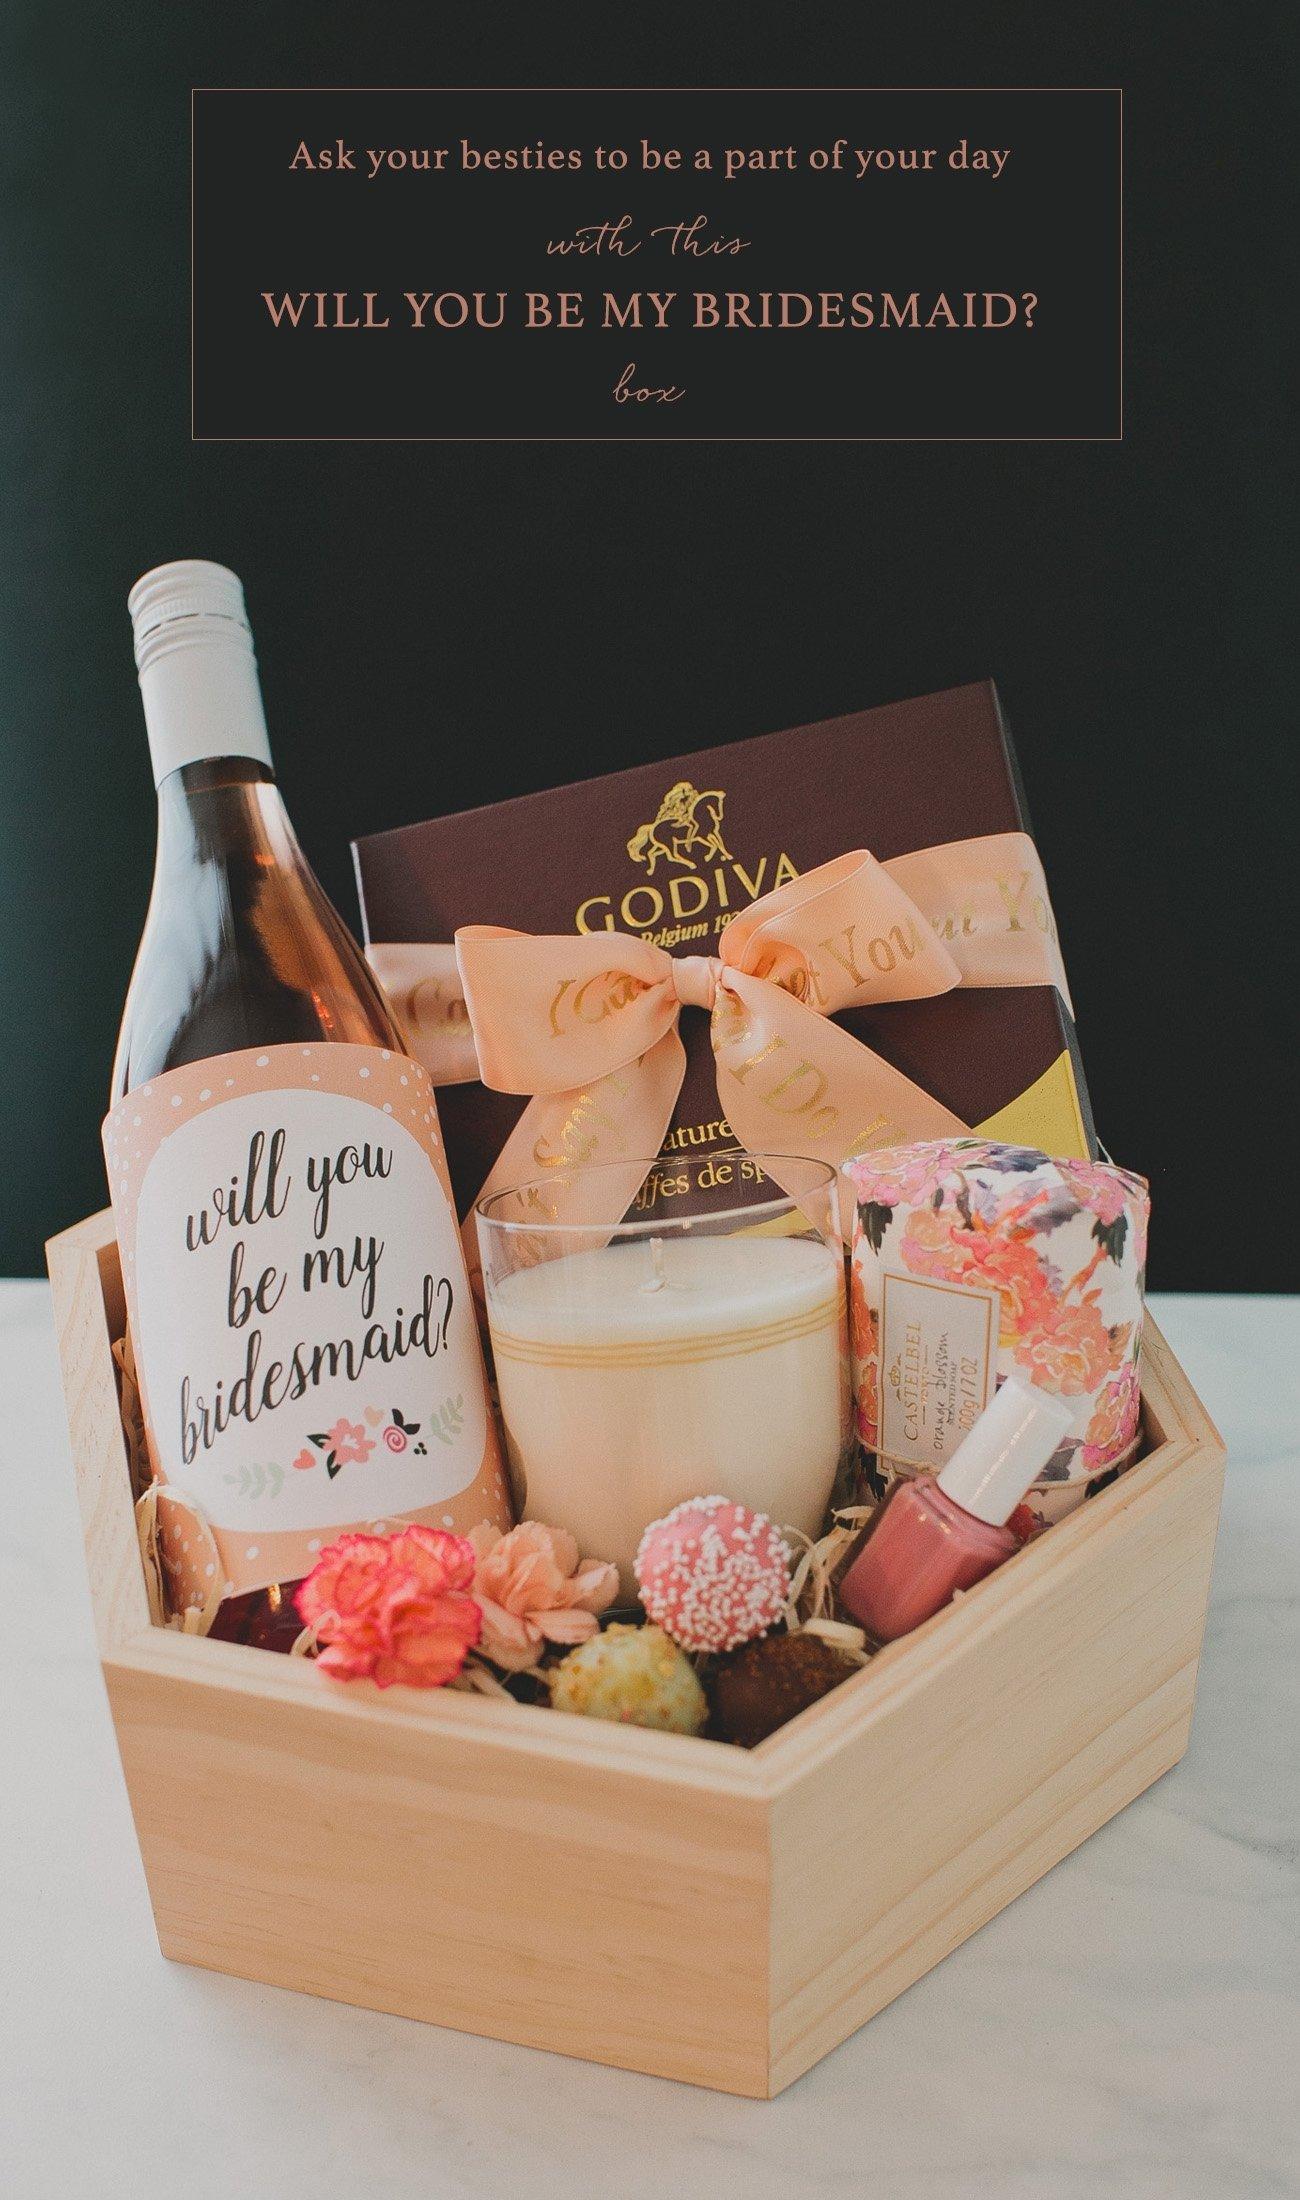 10 Wonderful Diy Will You Be My Bridesmaid Ideas diy bridesmaid gift box with godiva green wedding shoes 2020